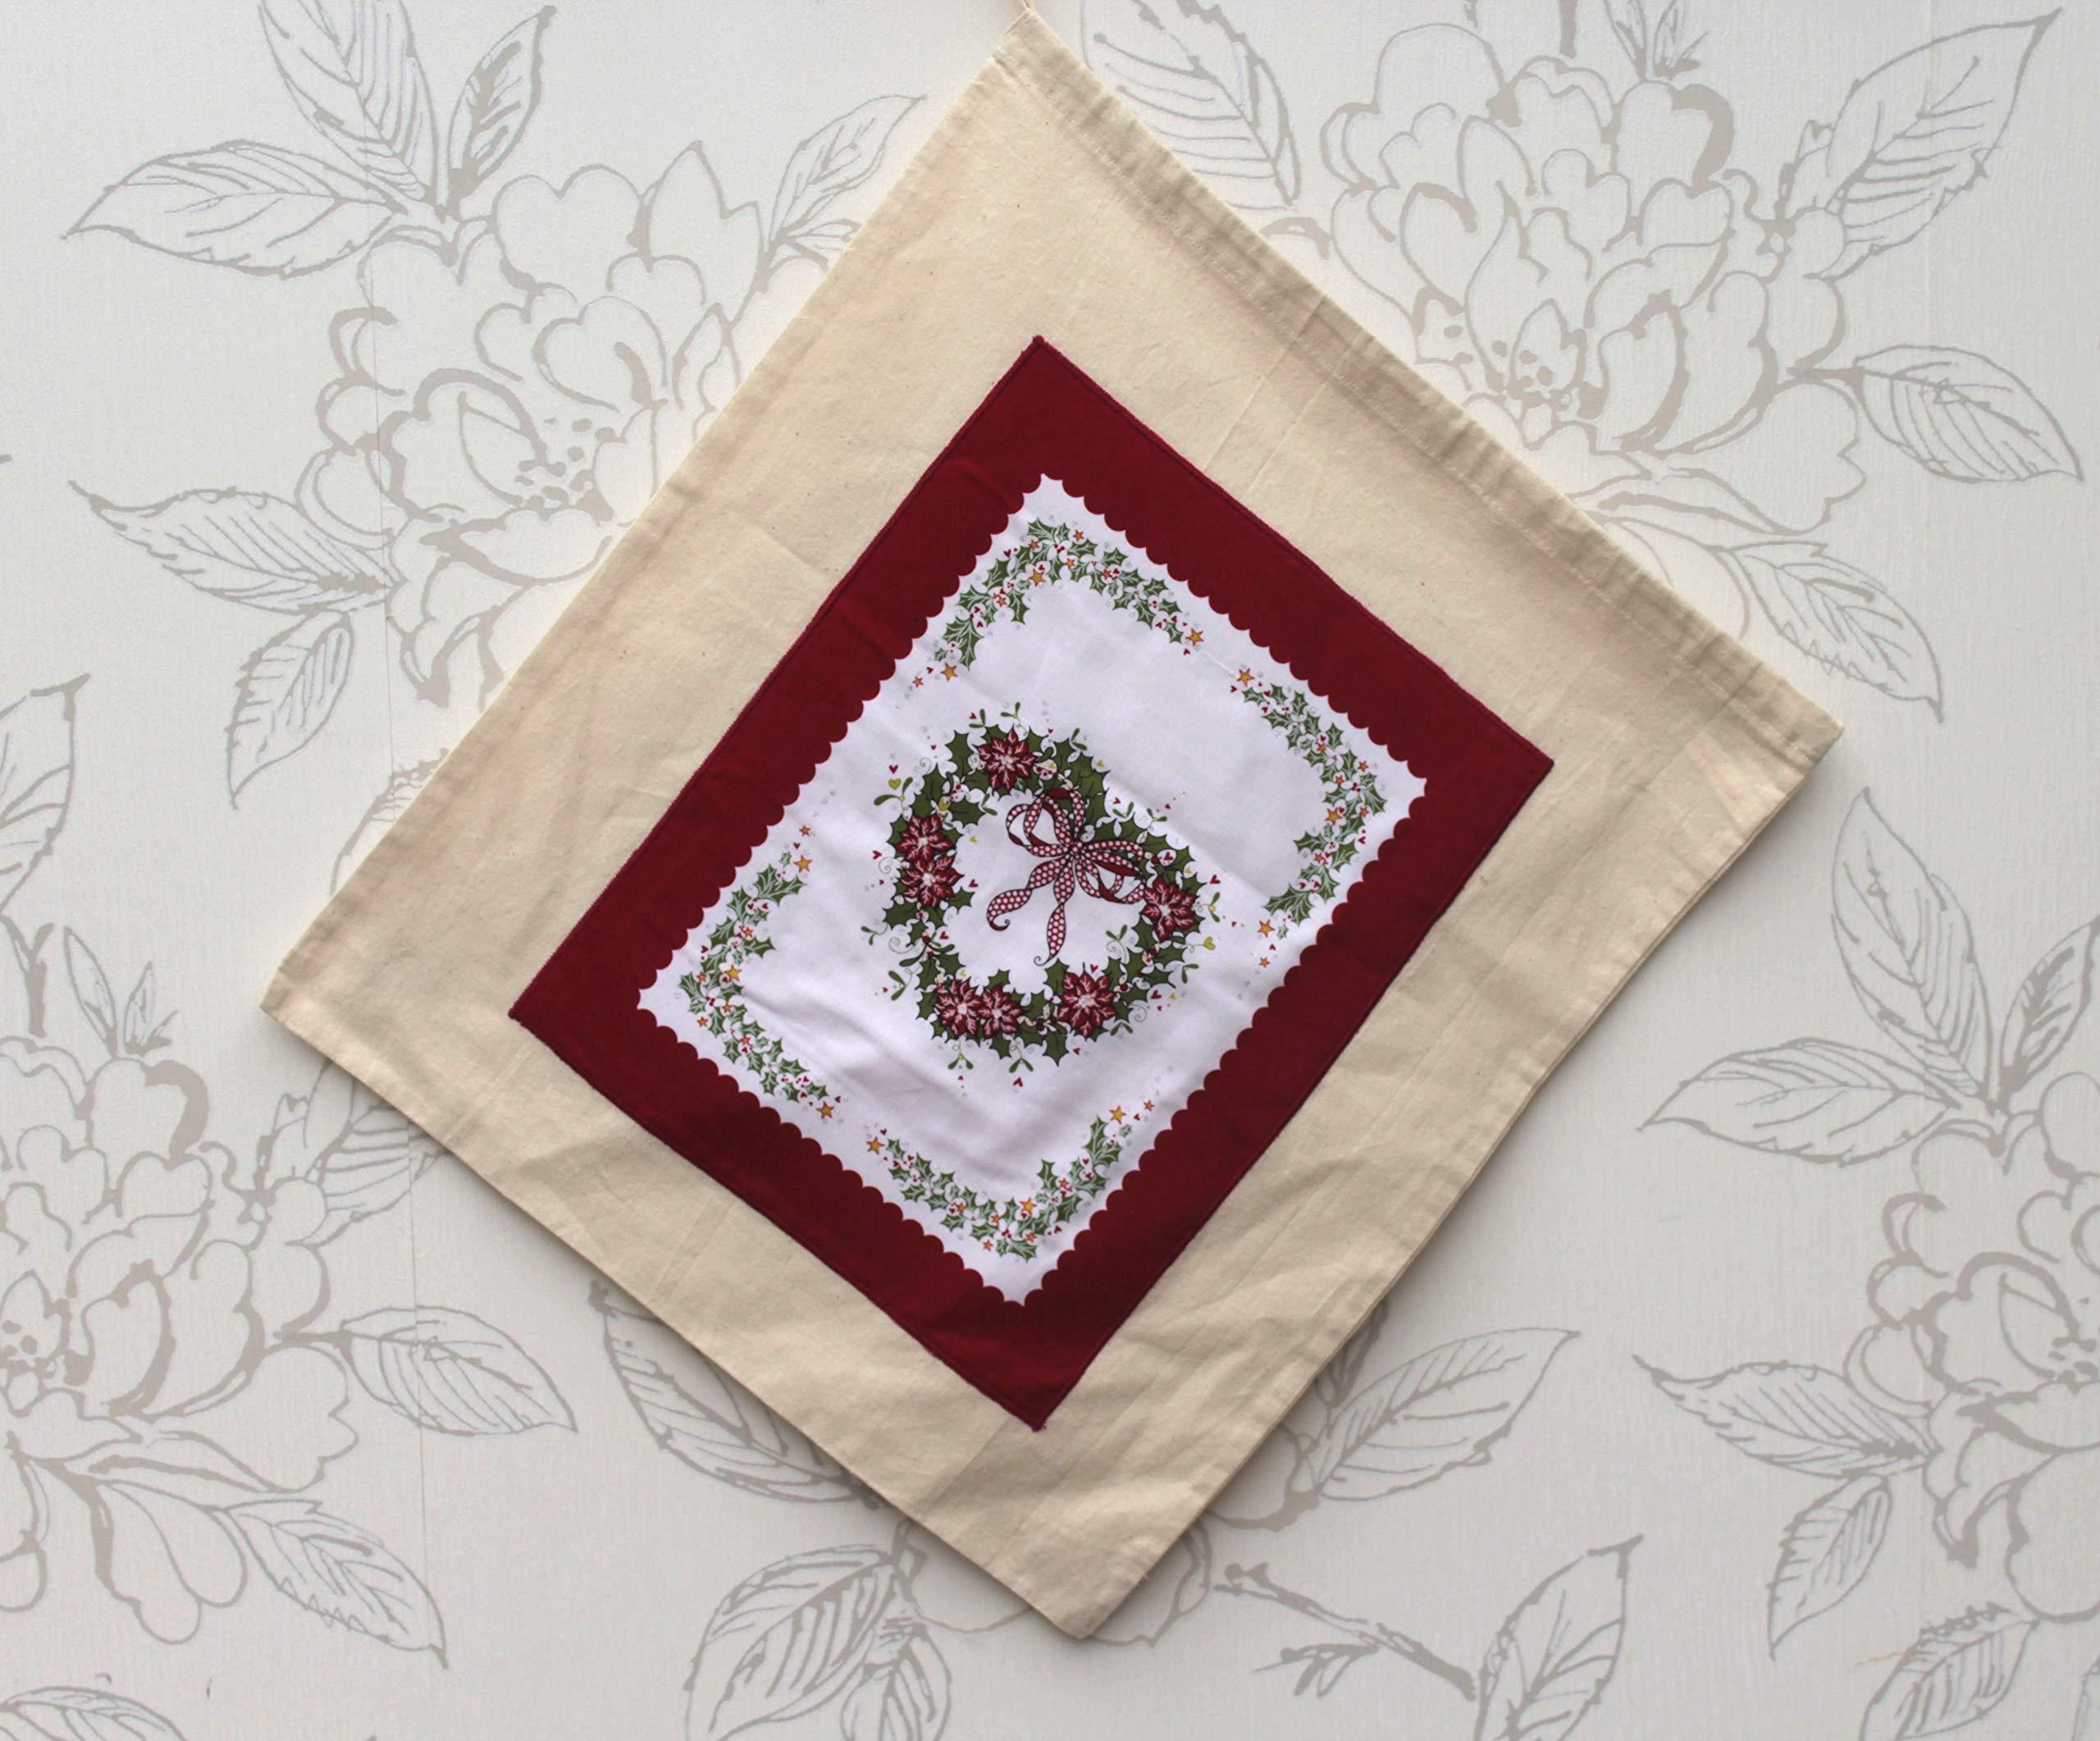 Christmas Poinsettias Drawstring Bag - handmade-bags